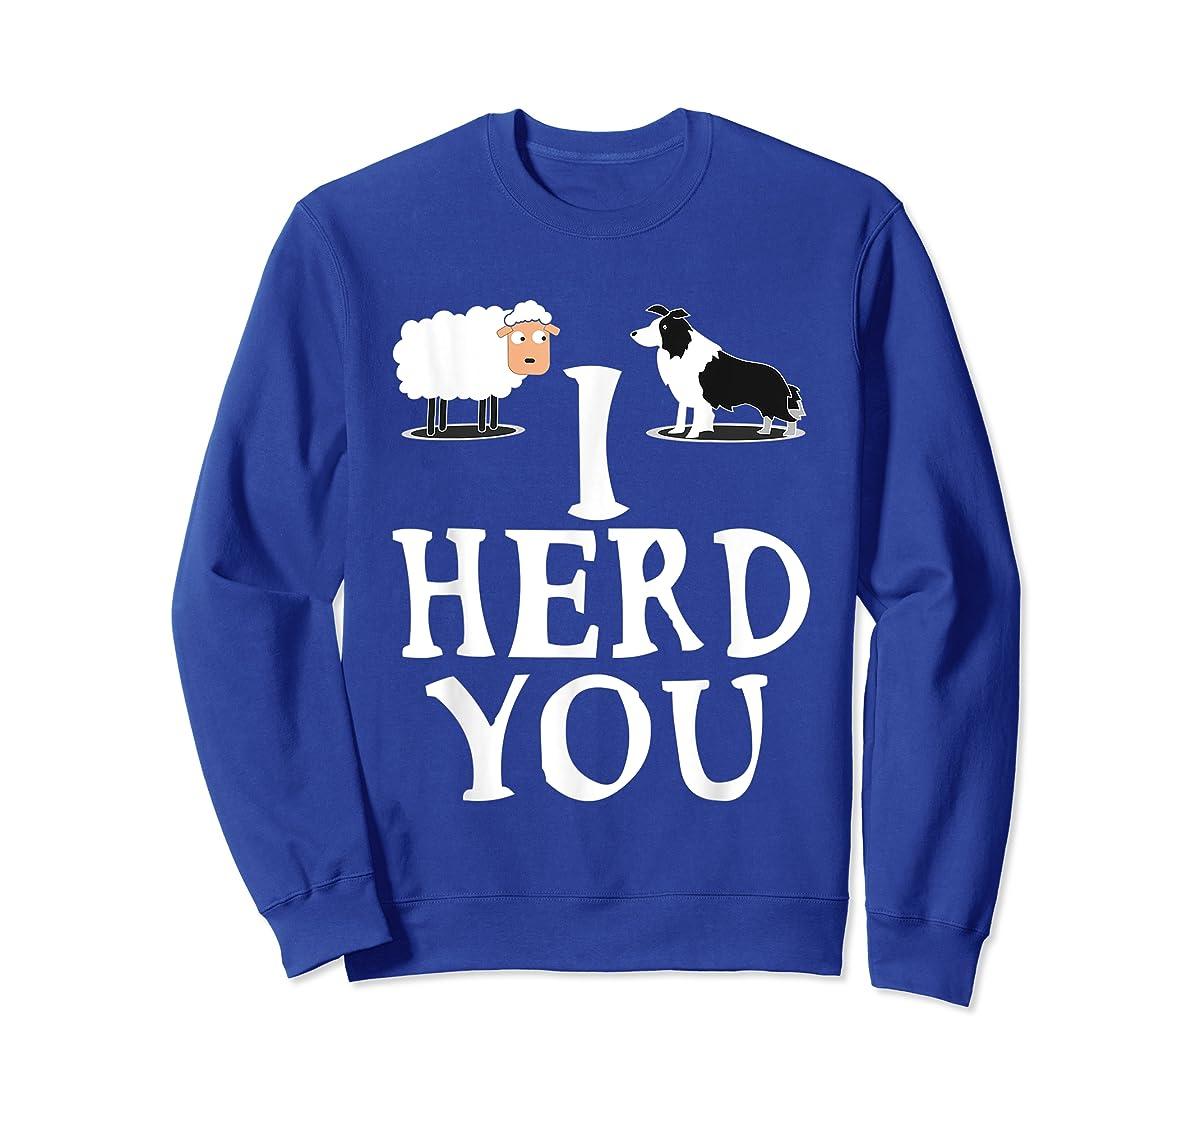 I HERD YOU BORDER COLLIE T shirt Gifts for Men Women Kids-Sweatshirt-Royal